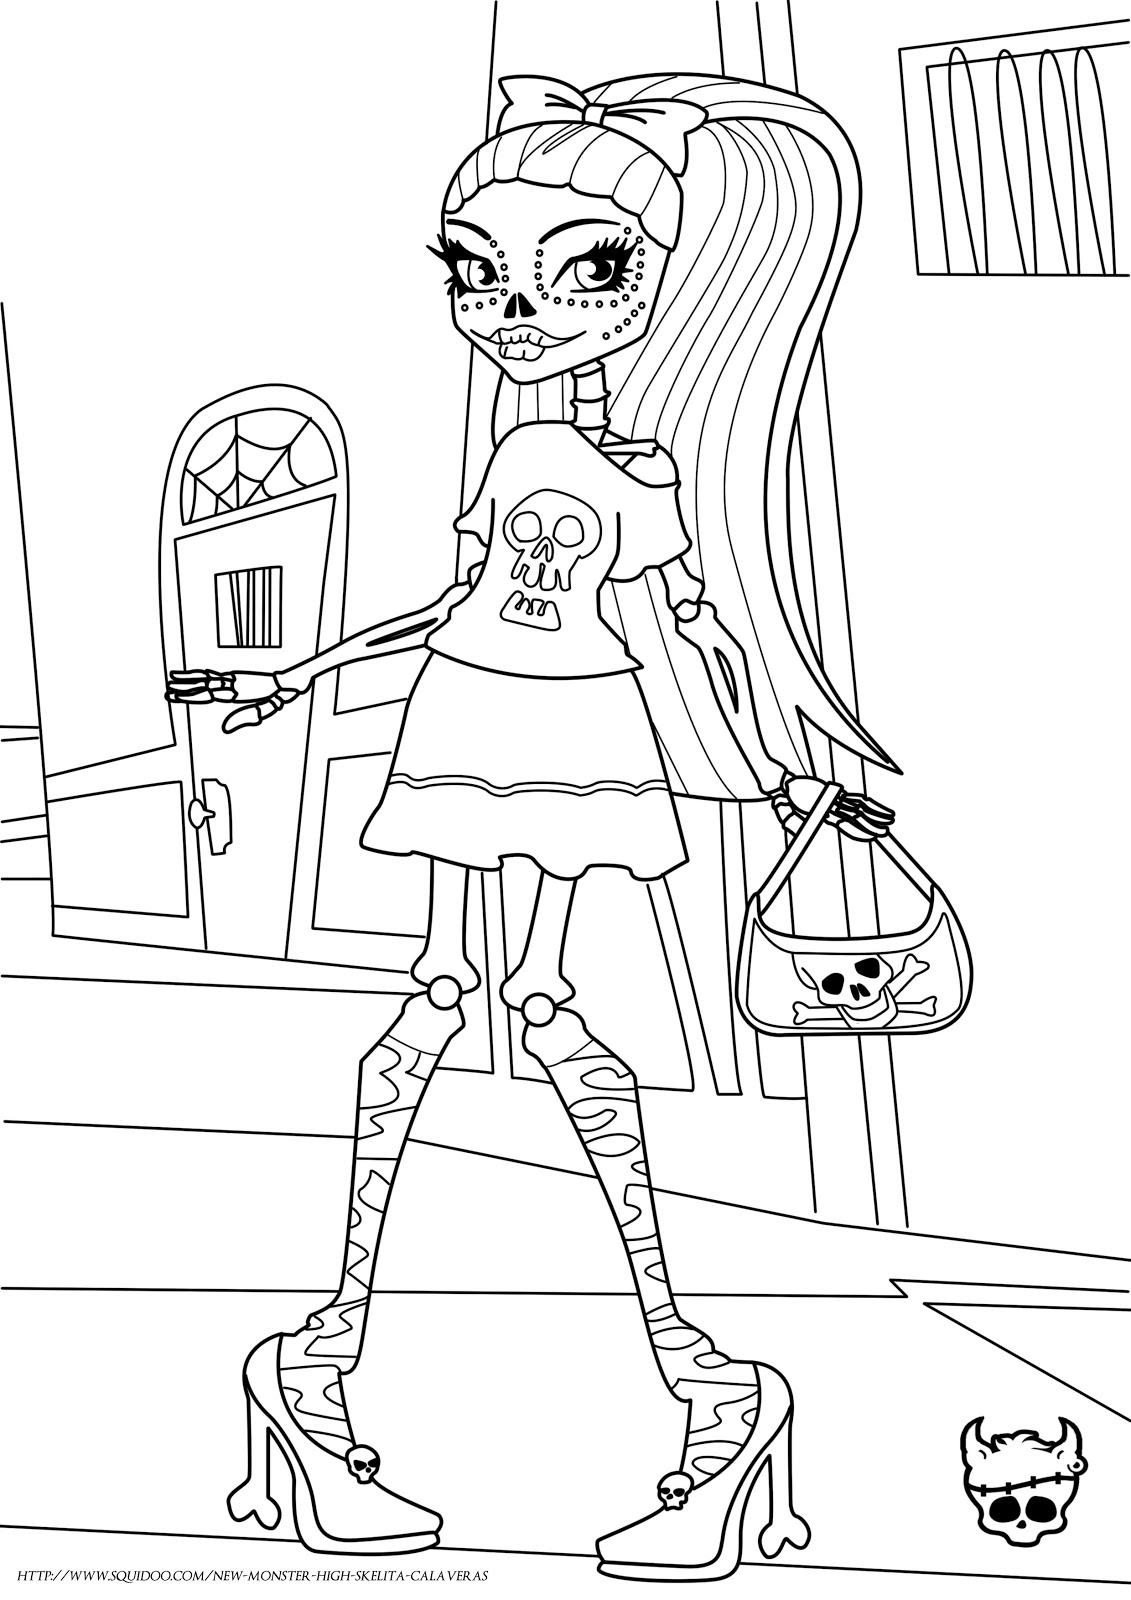 Information about munecasmonsterhigh.com: Muñecas Monster